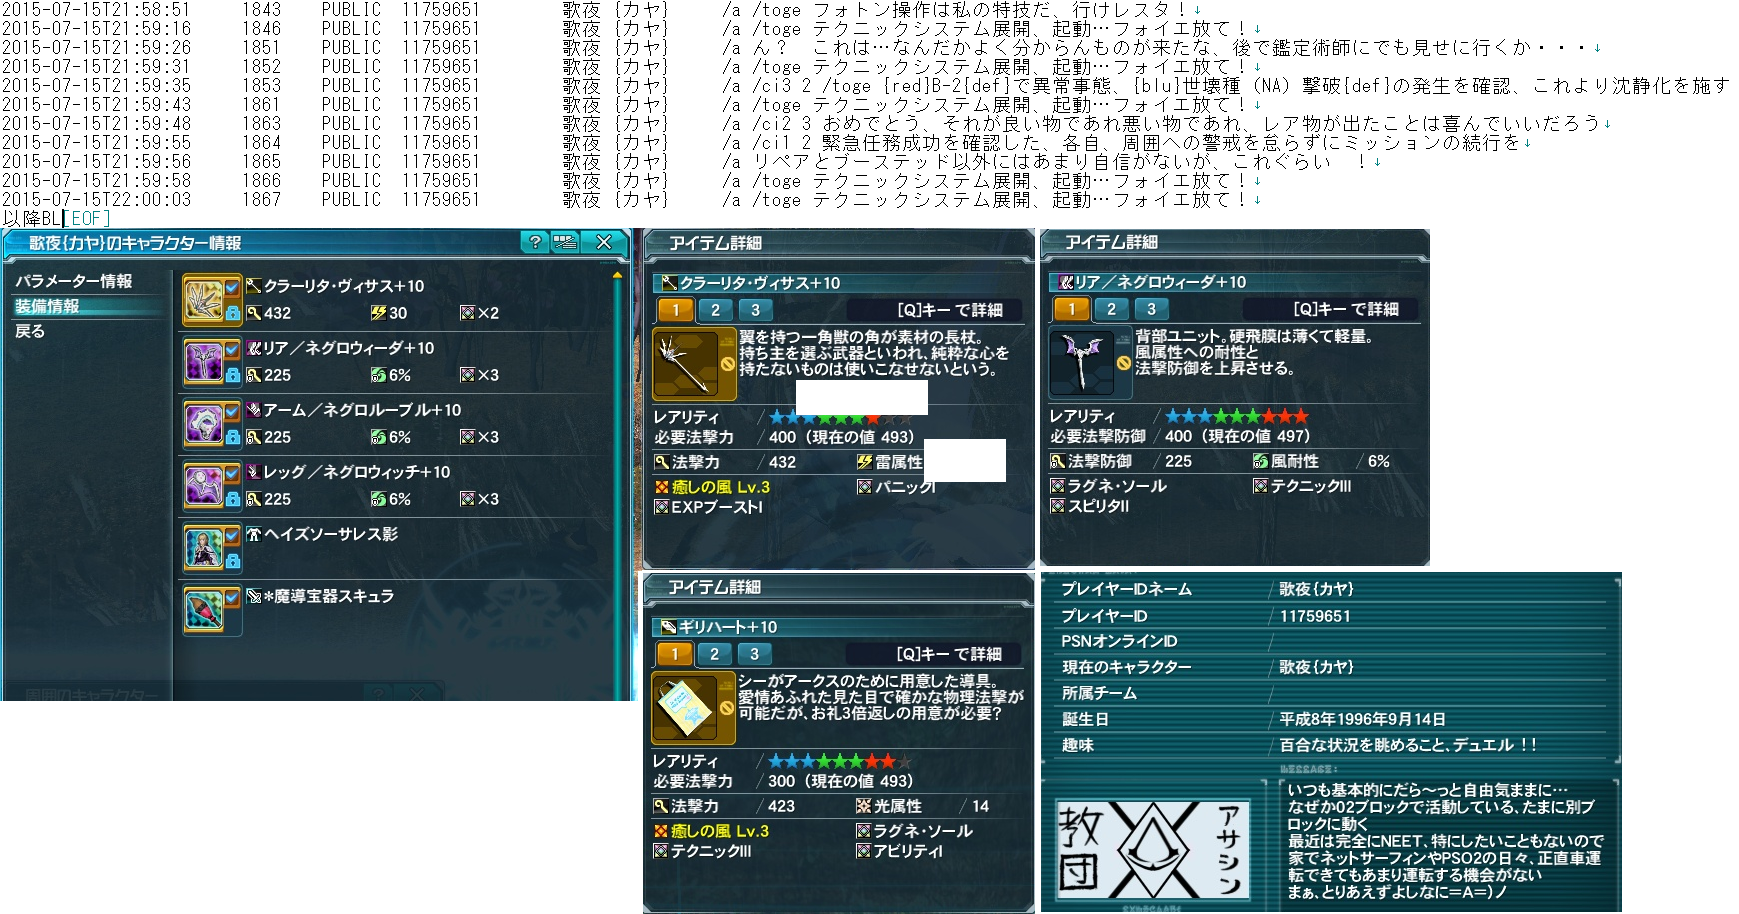 【PSO2】PHANTASY STAR ONLINE2 フェオ鯖晒しスレ79 [転載禁止]©2ch.net YouTube動画>14本 ->画像>229枚